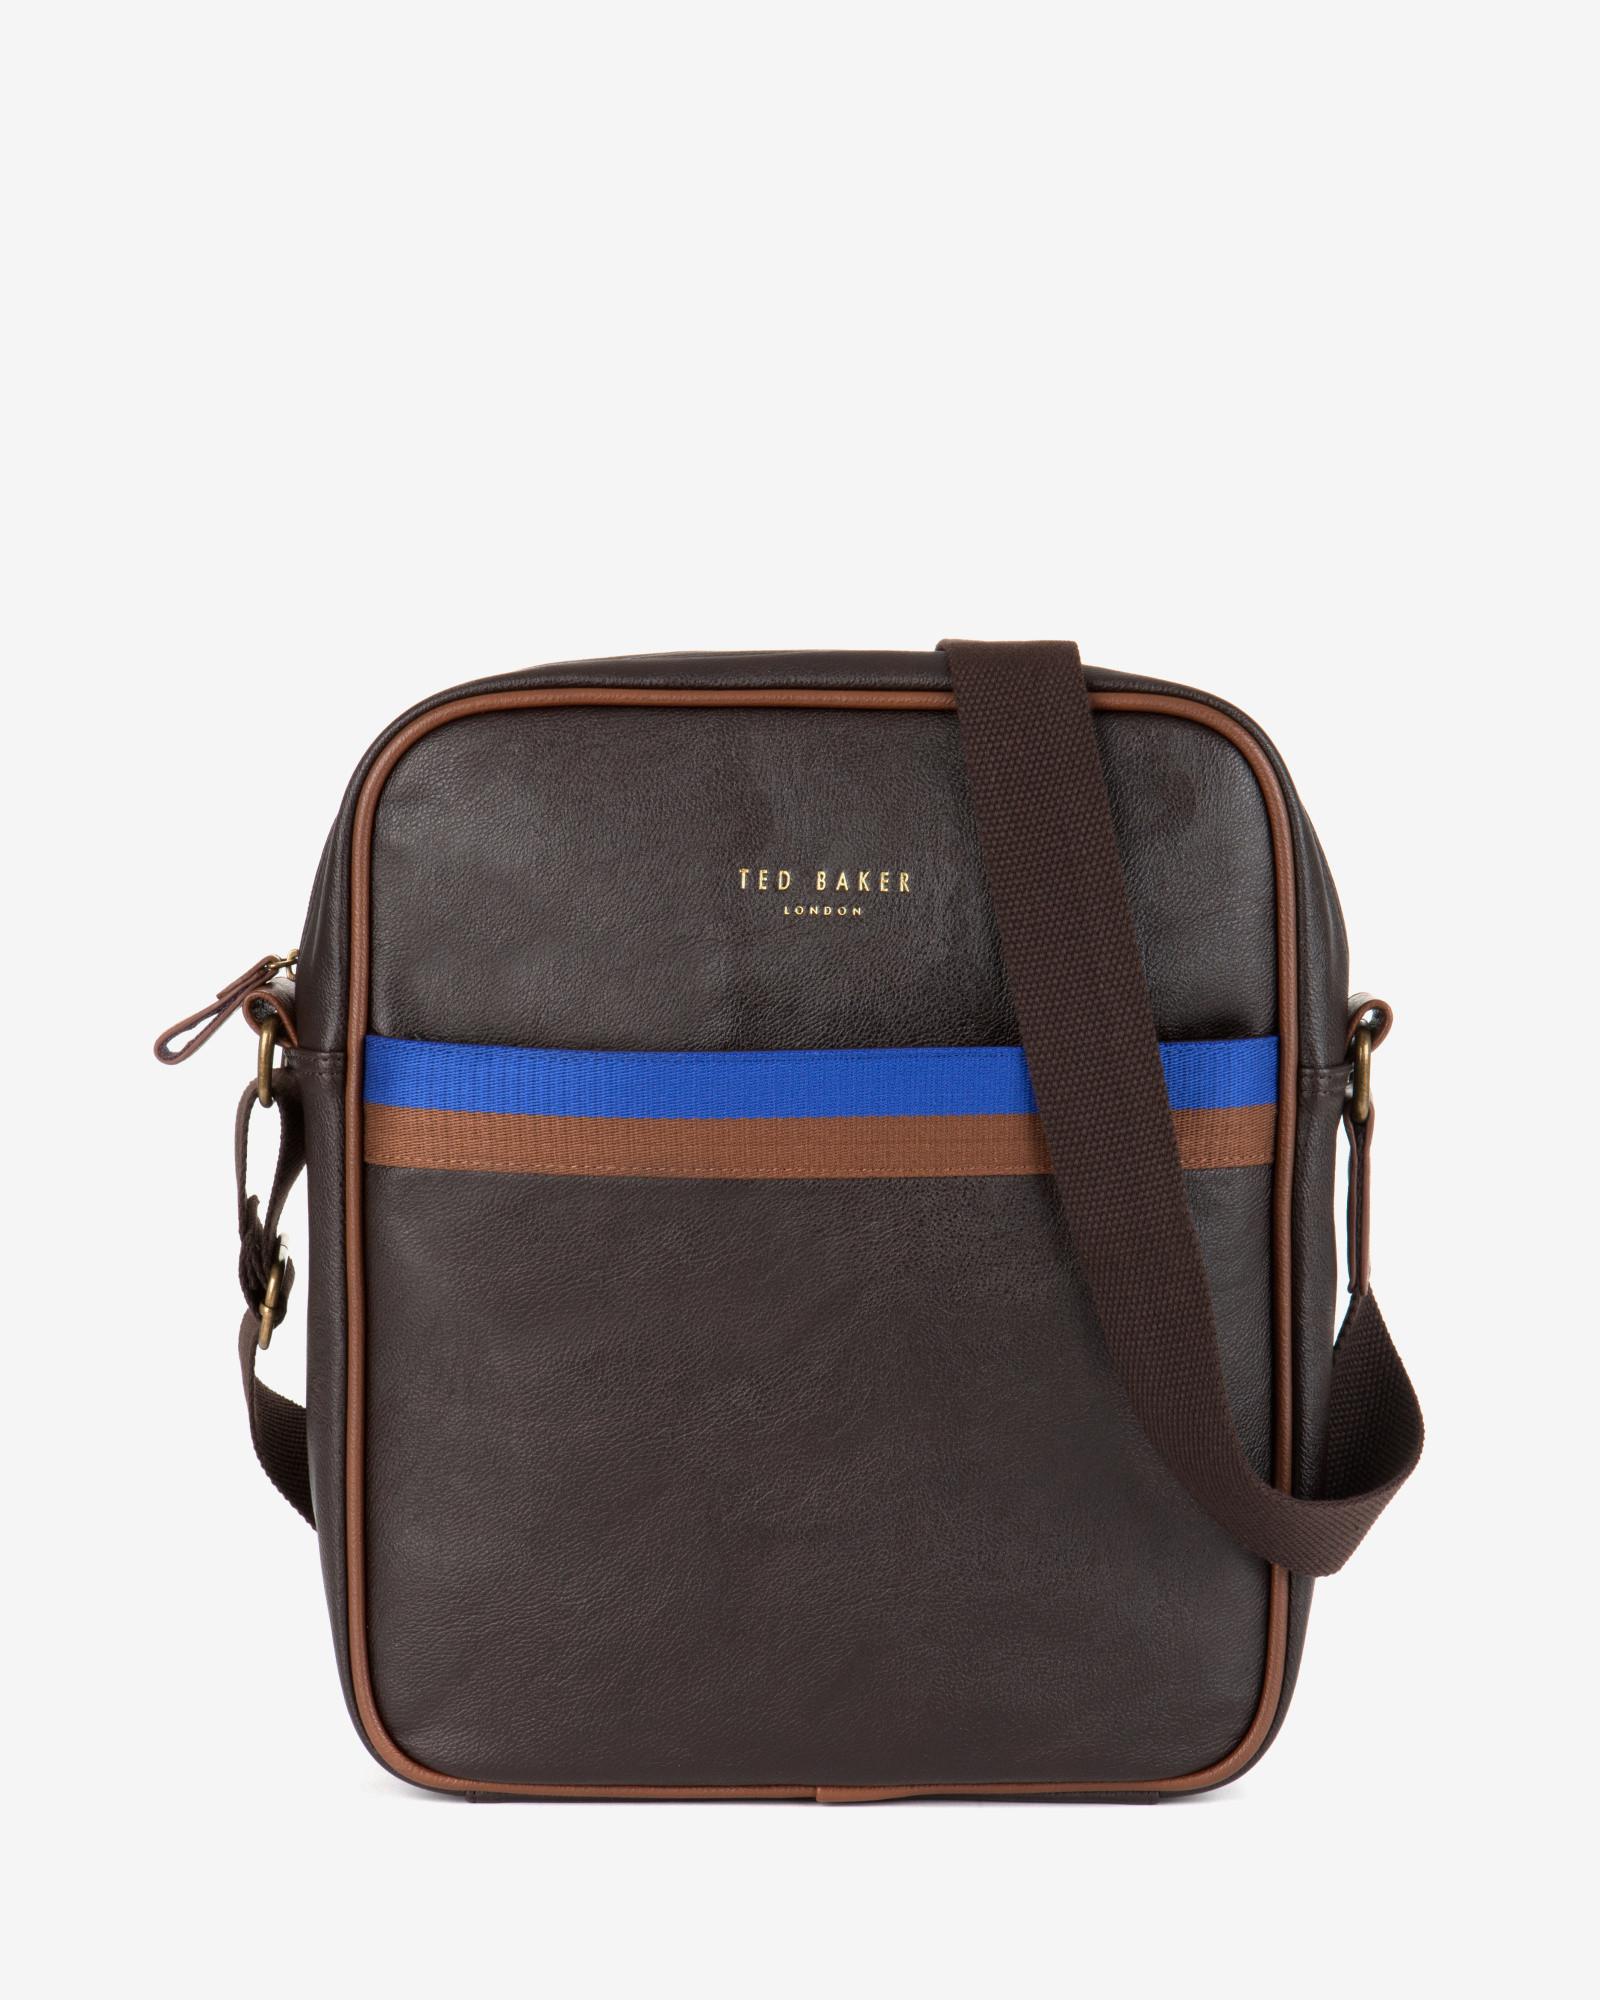 Brown For Body Men Baker In Lyst Bag Ted Cross Flight y8vNOmn0w